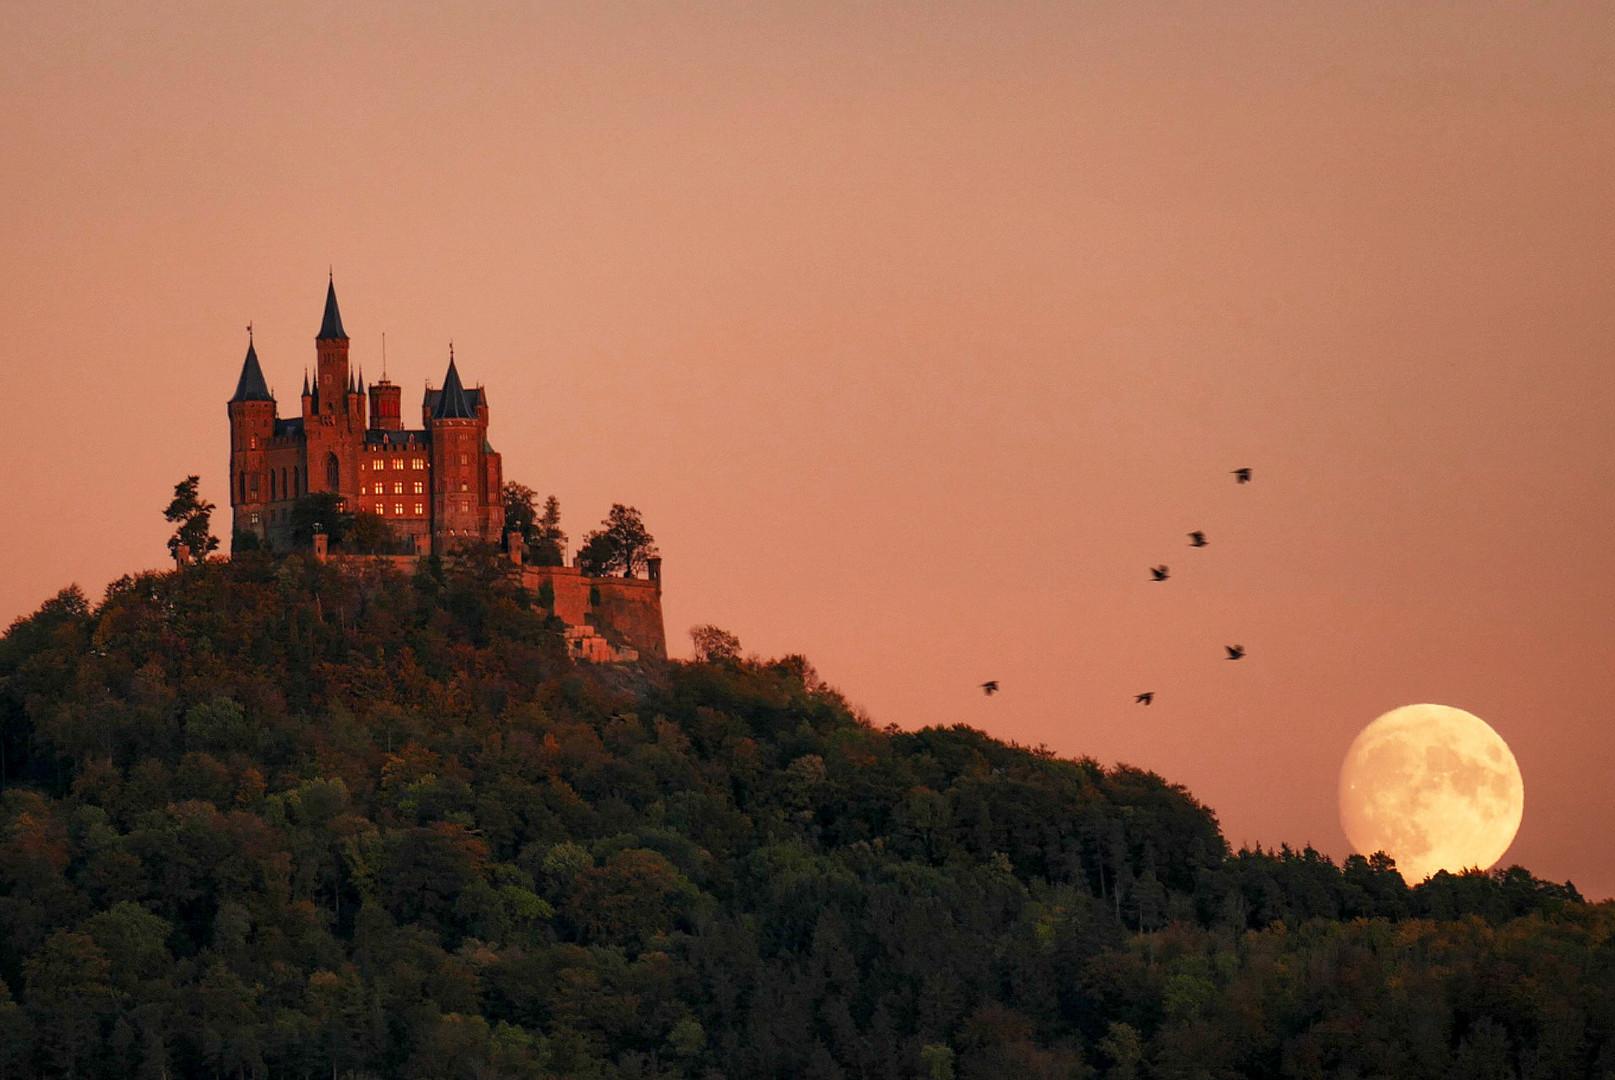 Mondaufgang hinter der Burg Hohenzollern